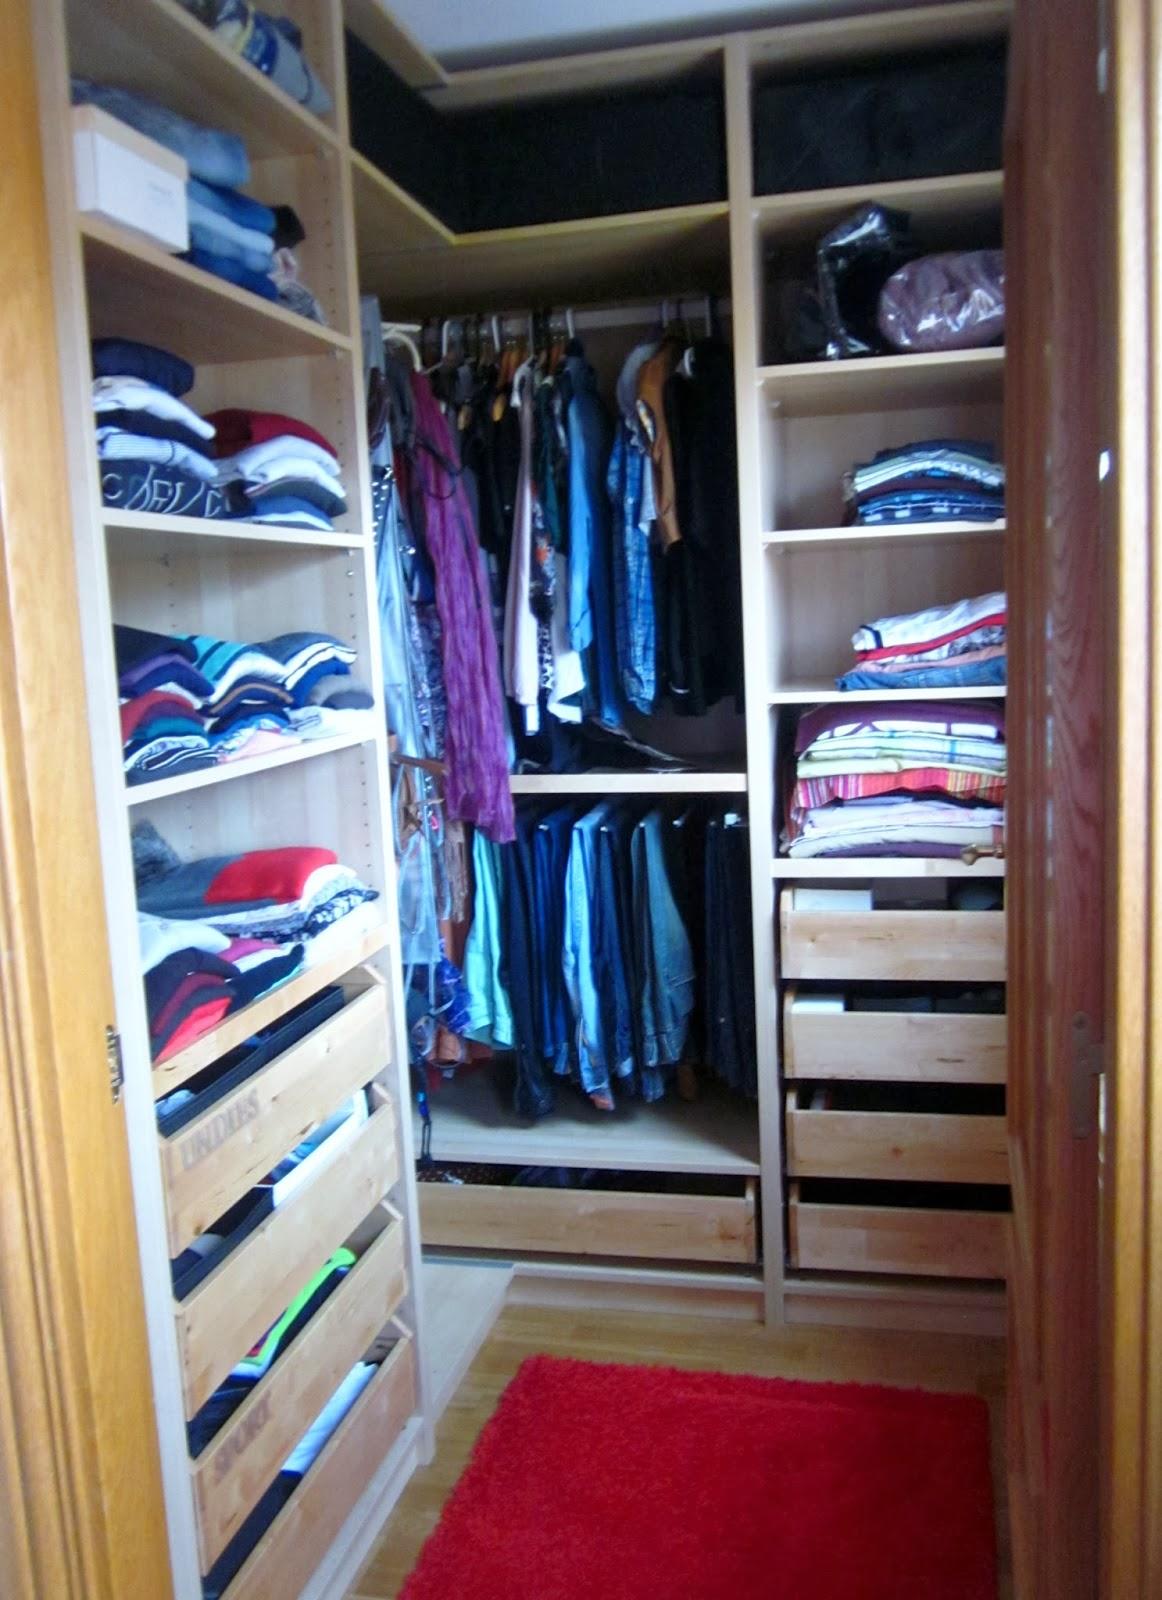 I d e a consejos y trucos para ordenar un armario - Ordenar armarios de ropa ...